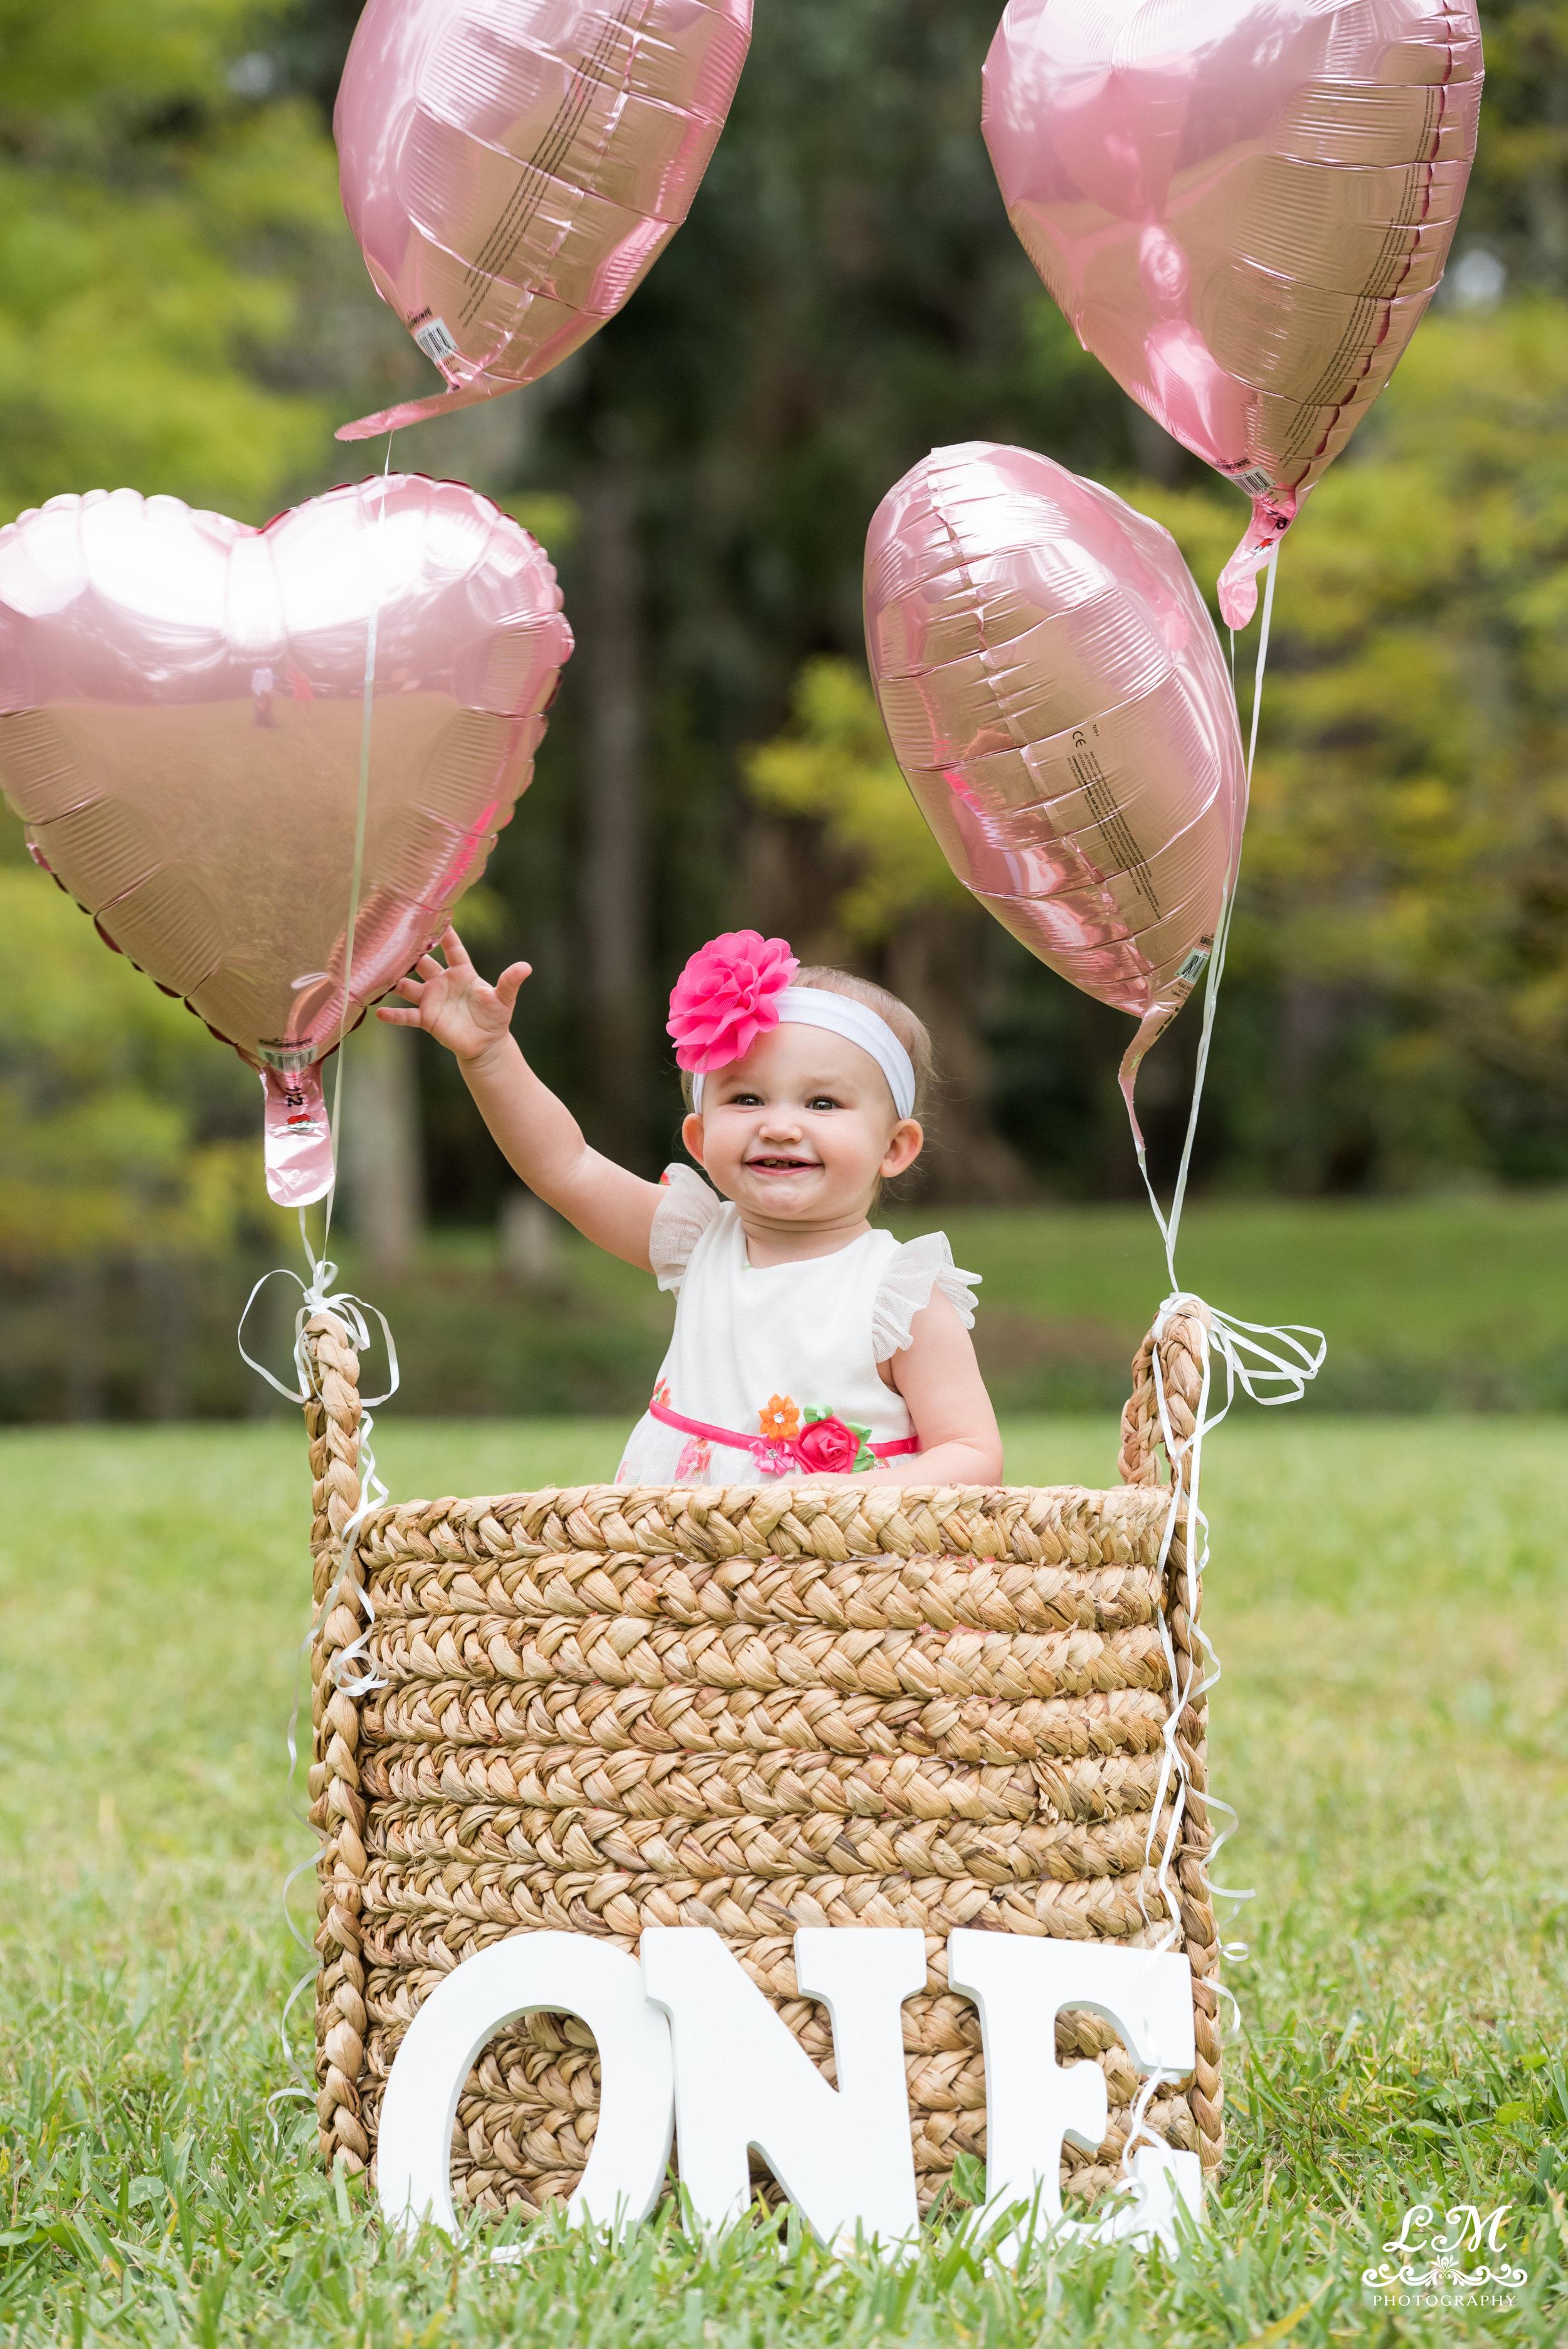 birthday girl with ballons